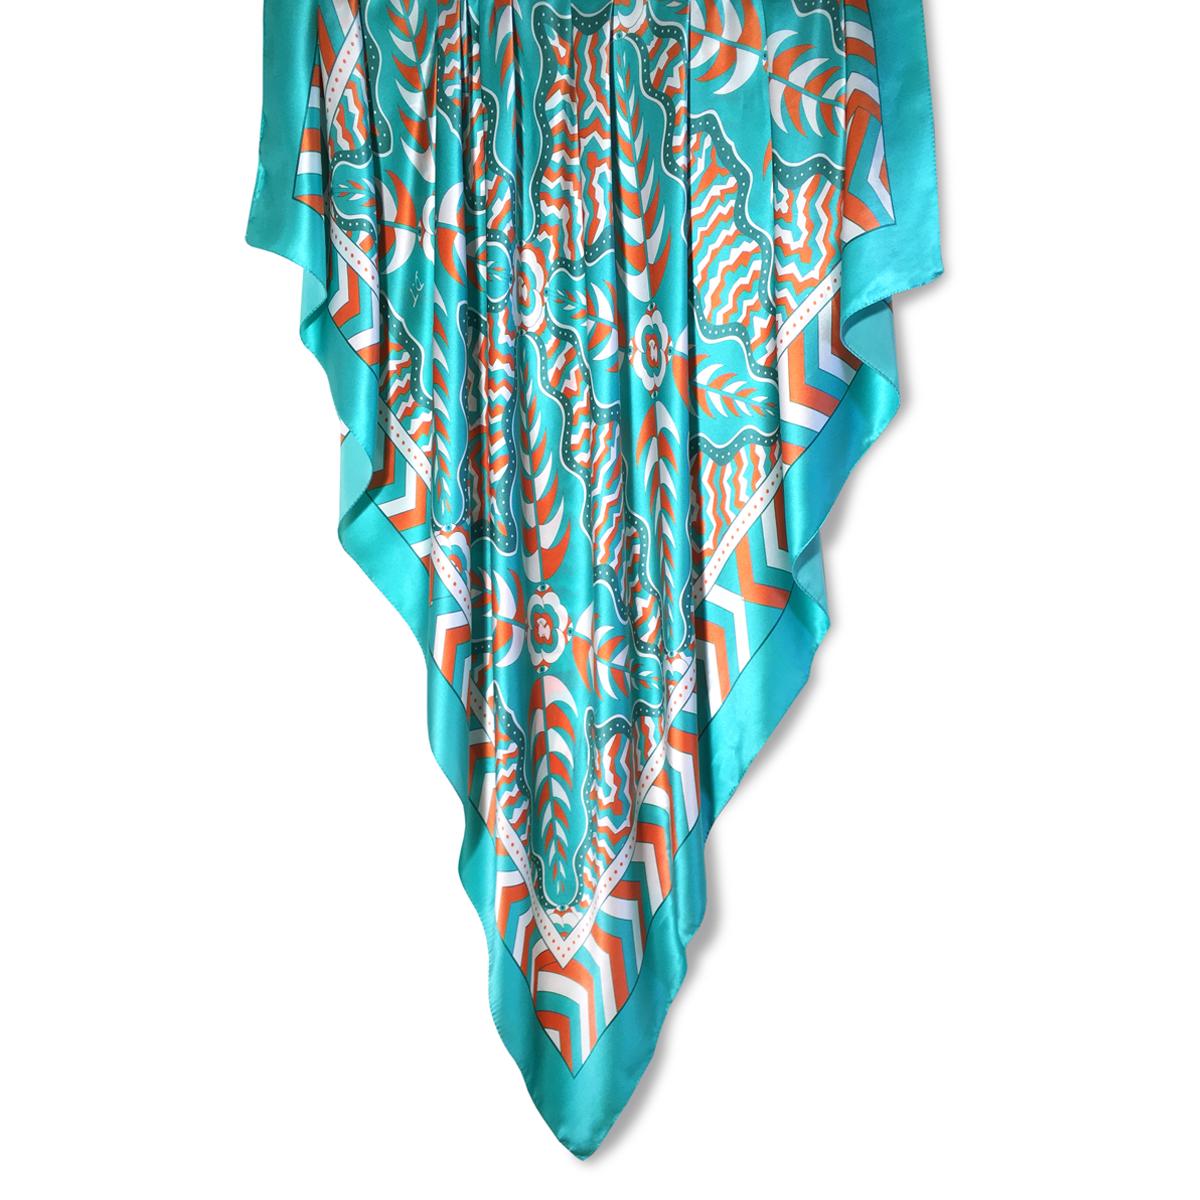 140x140cm Giant Square Scarf 100% Silk